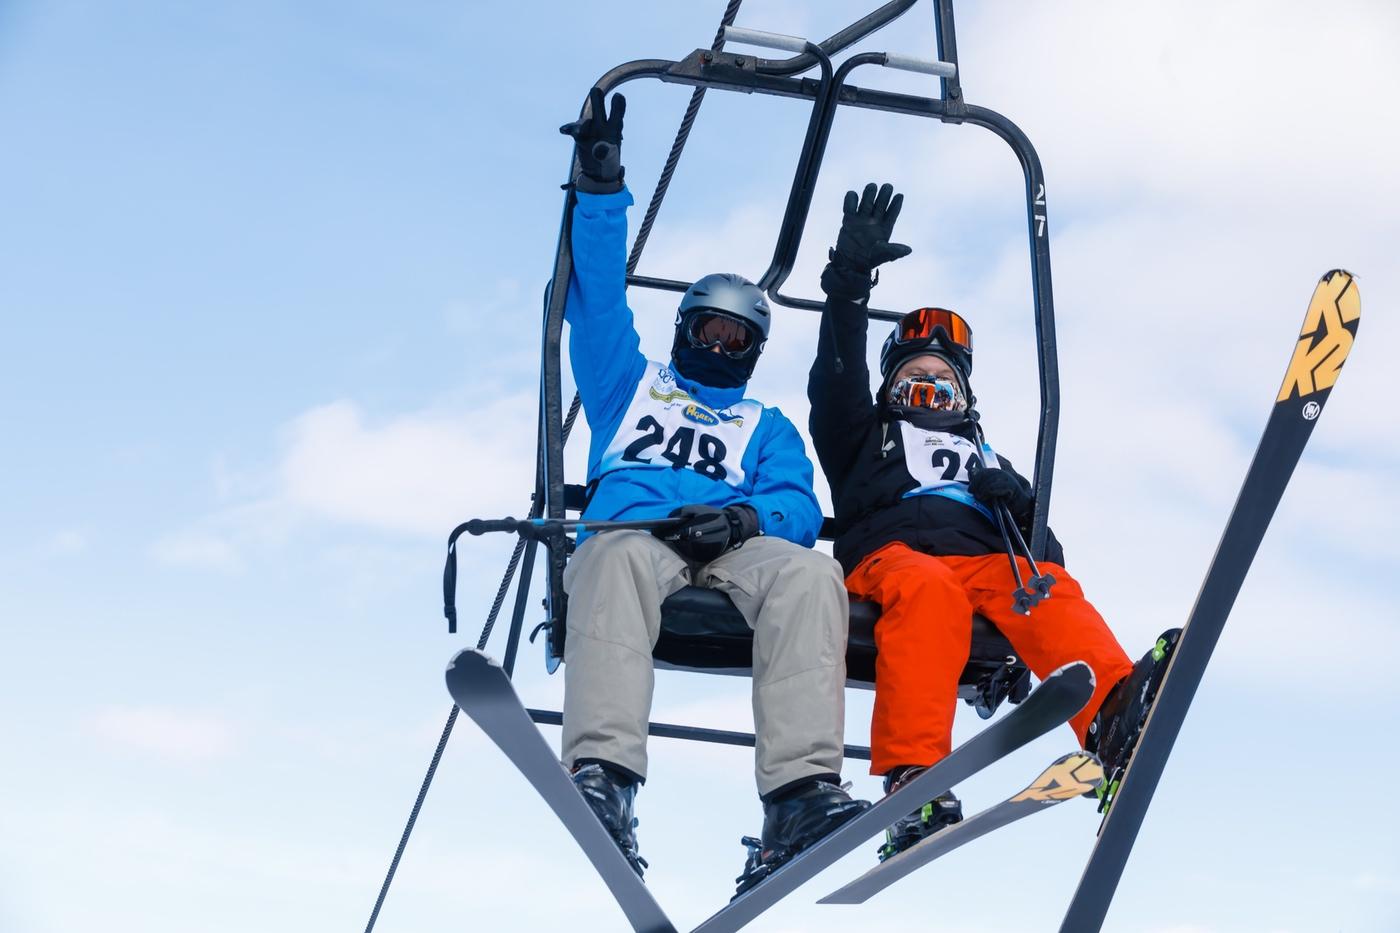 WinterKids Downhill 24 2021 SDP 3459